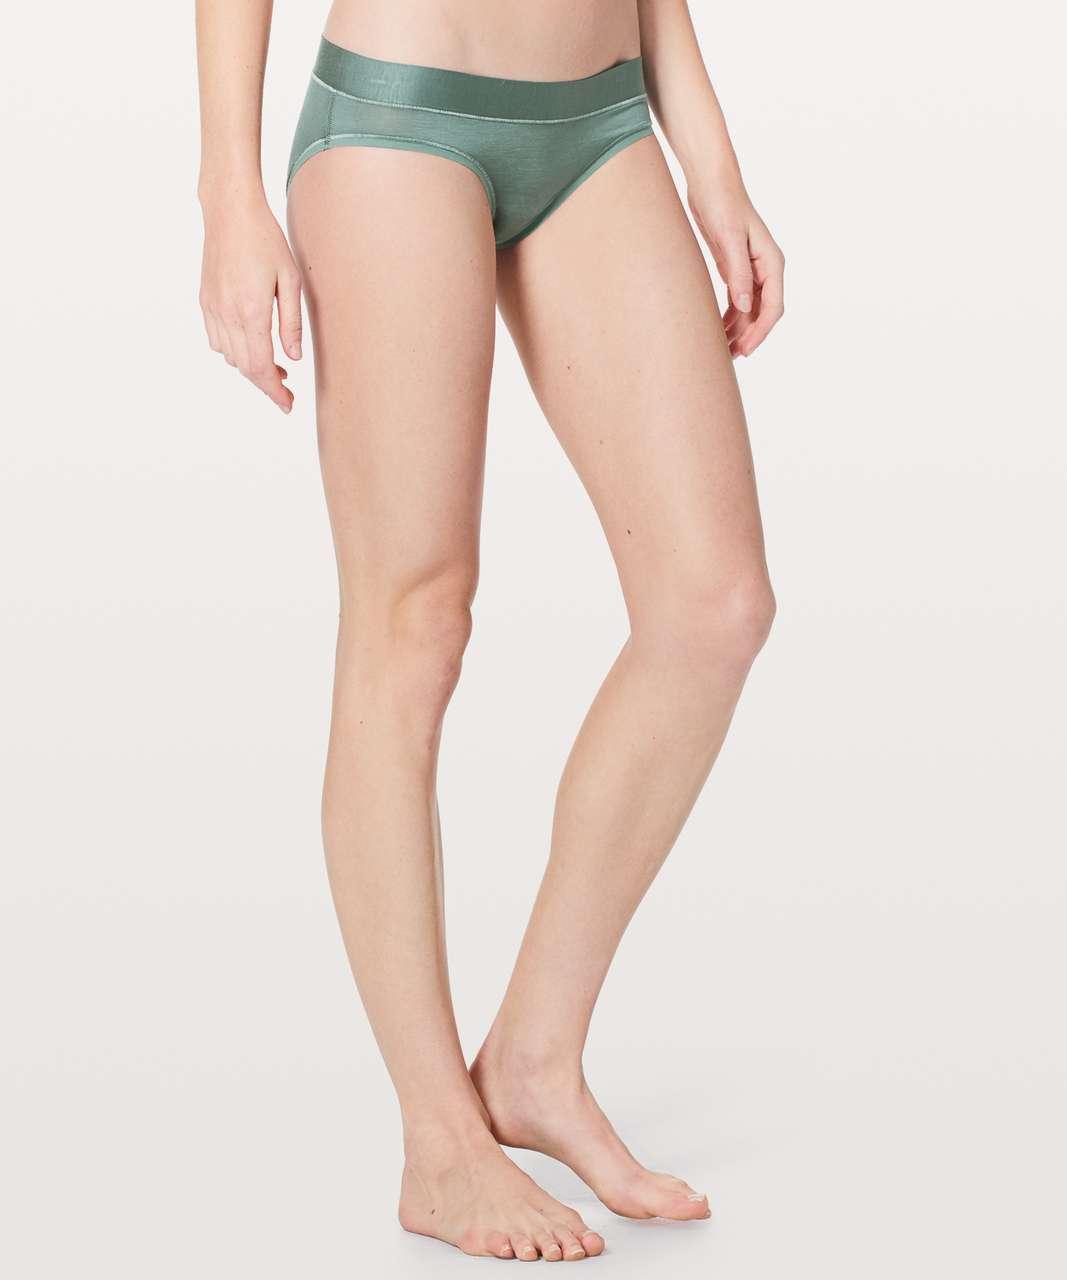 Lululemon Mula Bandhawear Bikini - Juniper